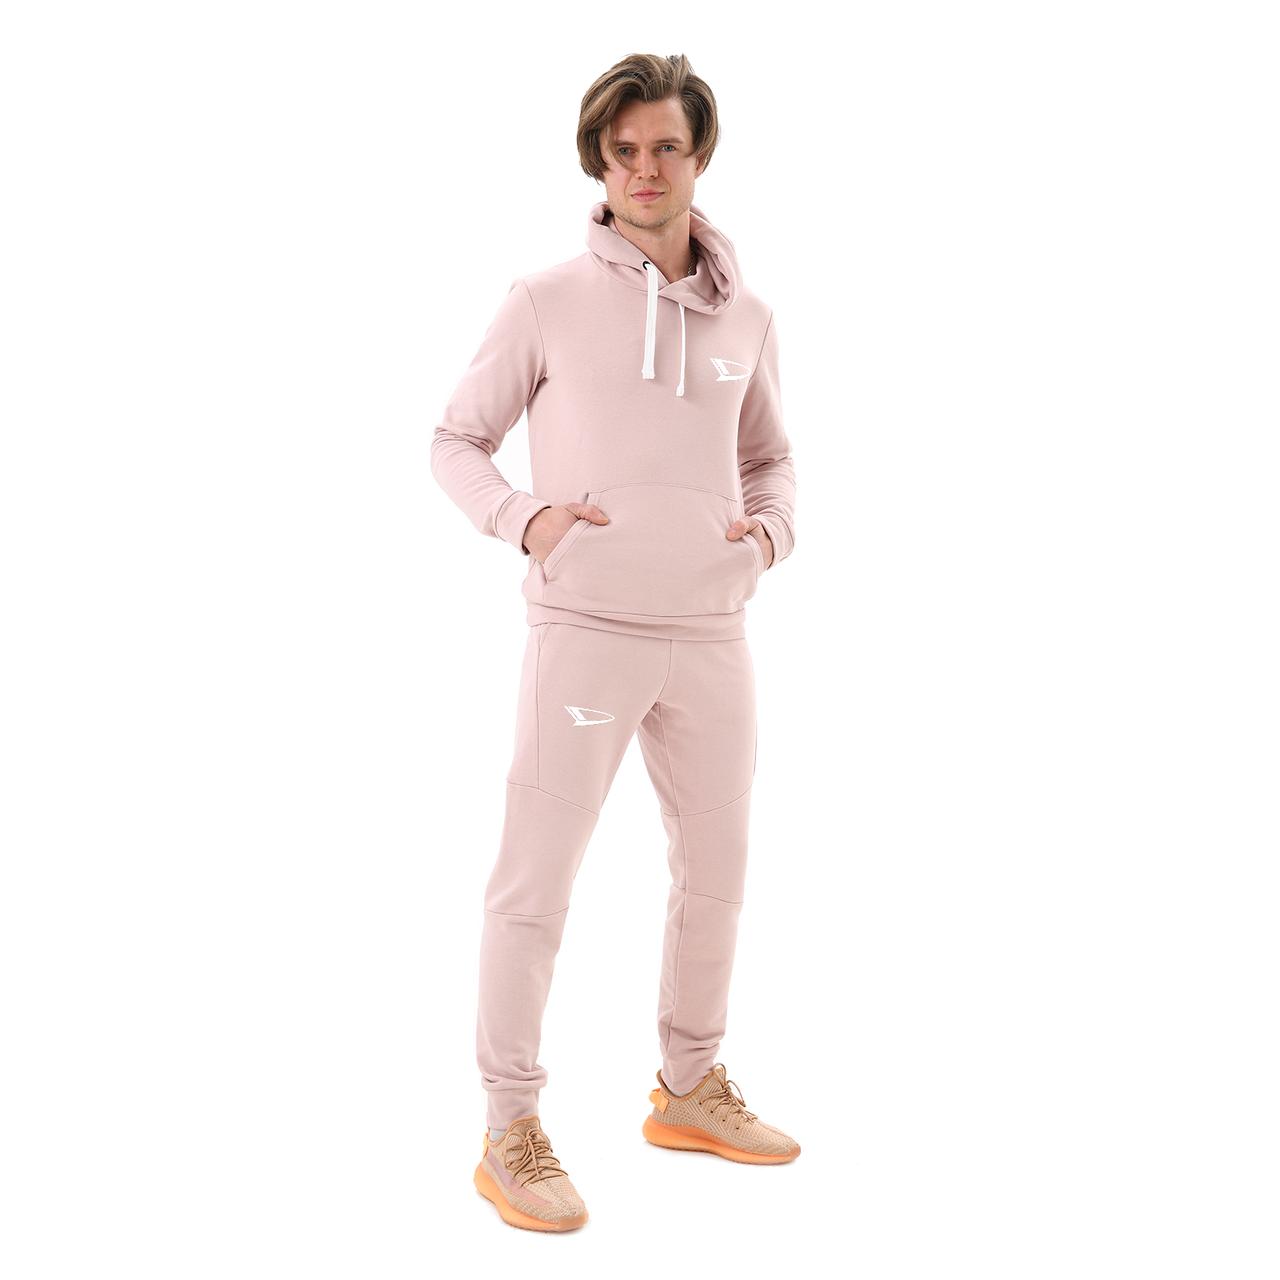 Мужской спортивный костюм Дайхатсу